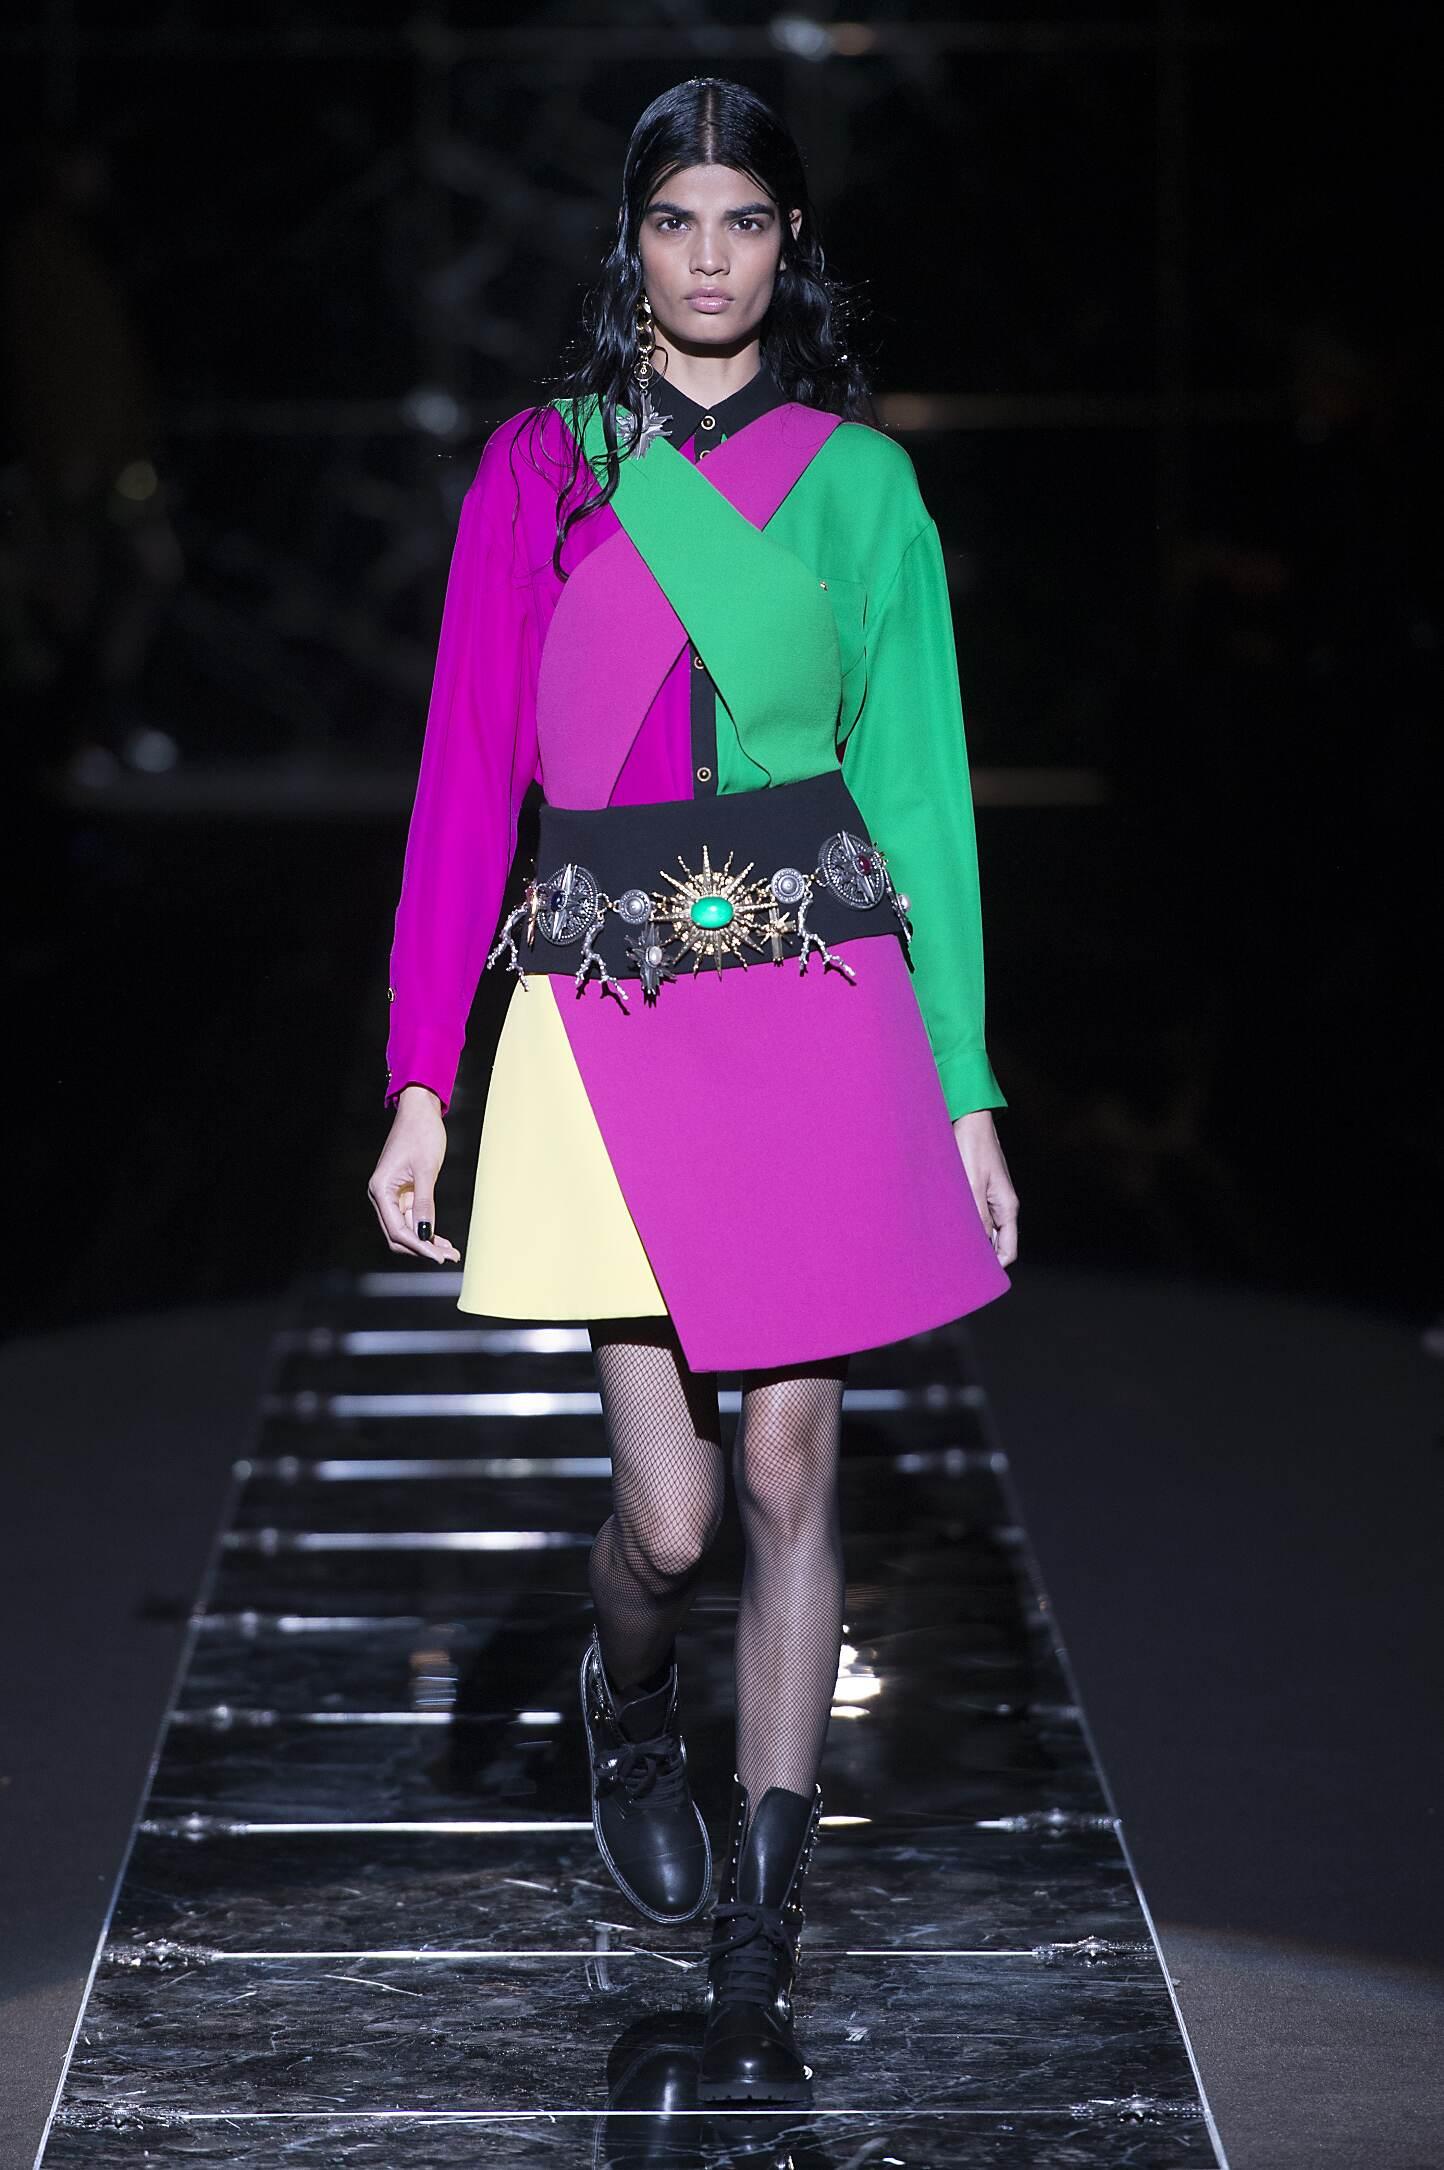 Fausto Puglisi Collection Woman Milan Fashion Week